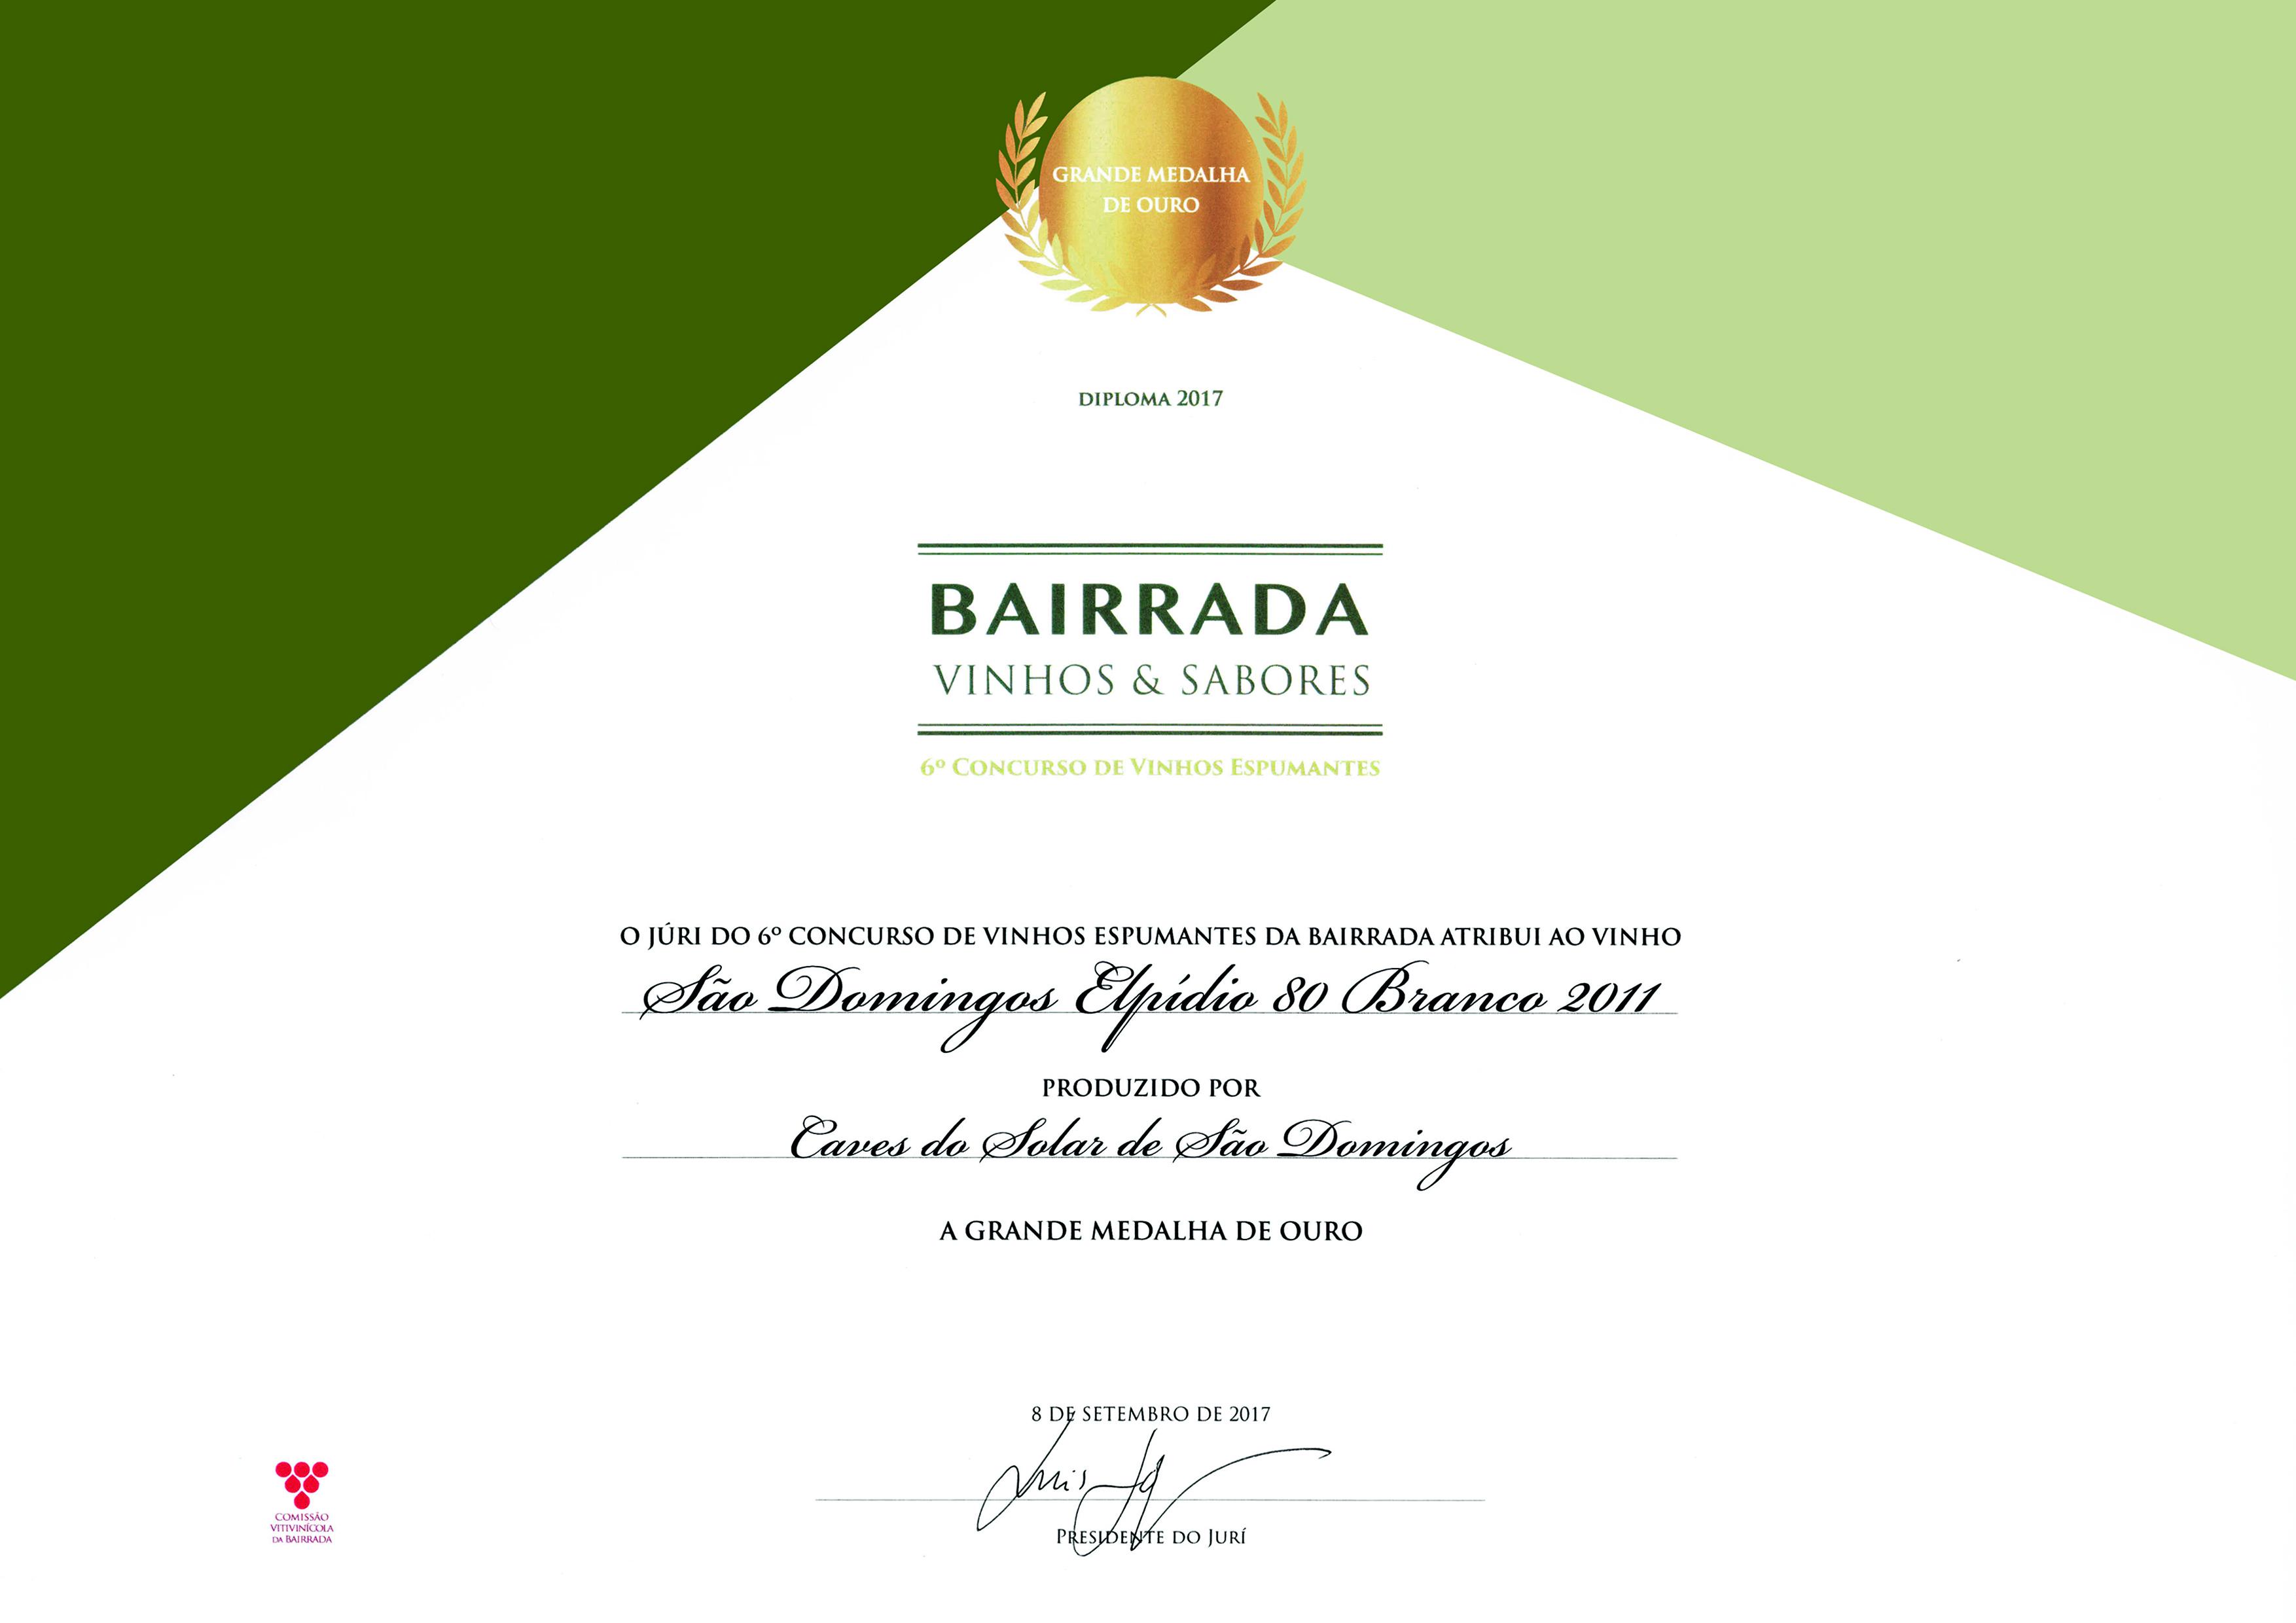 Grande Medalha de Ouro - Espumantes Bairrada 2017